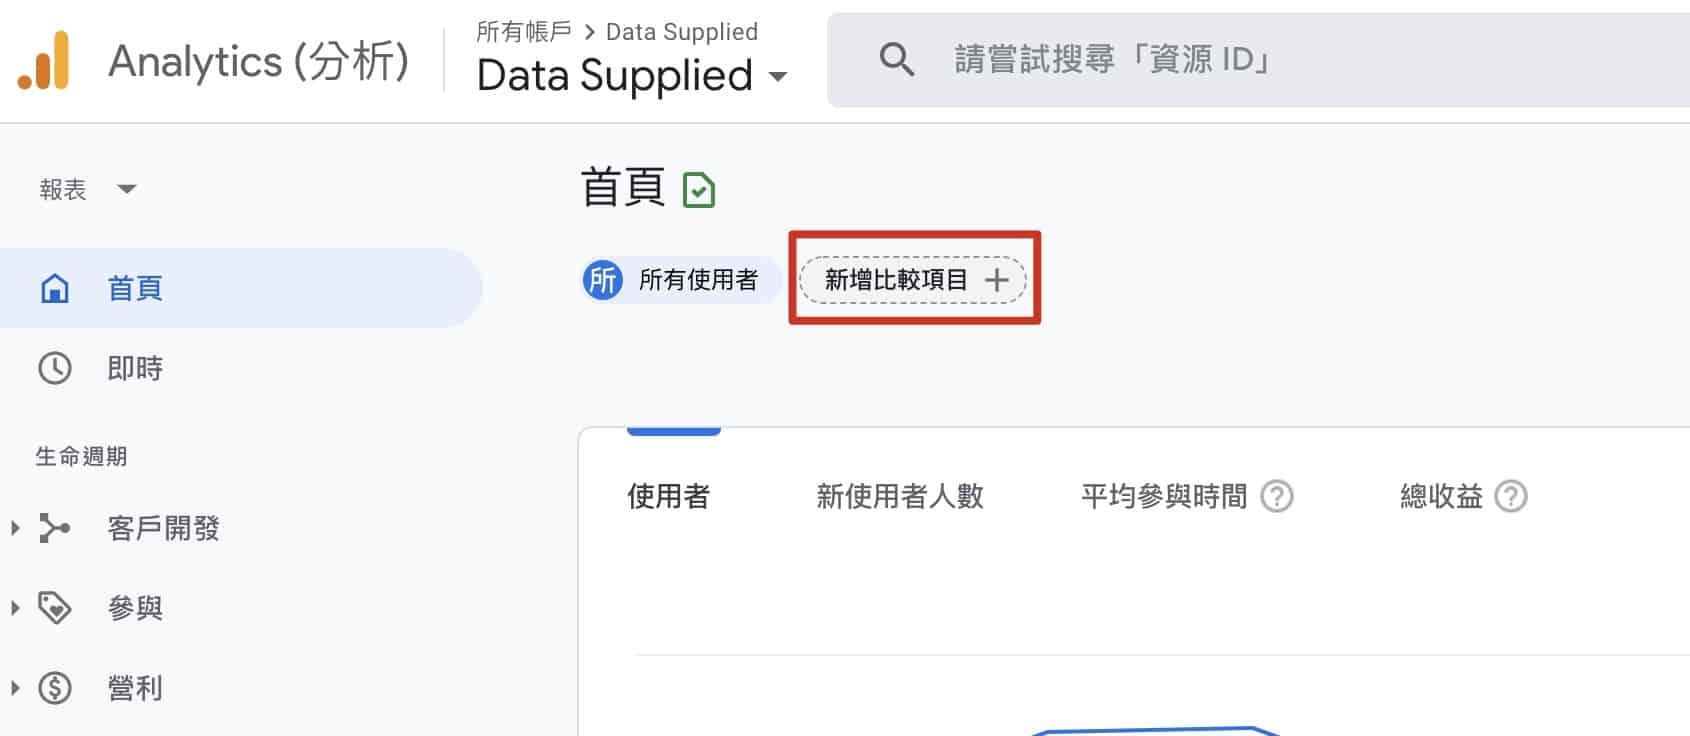 Google Analytics 4 預設報表 - 查看已登入使用者數據